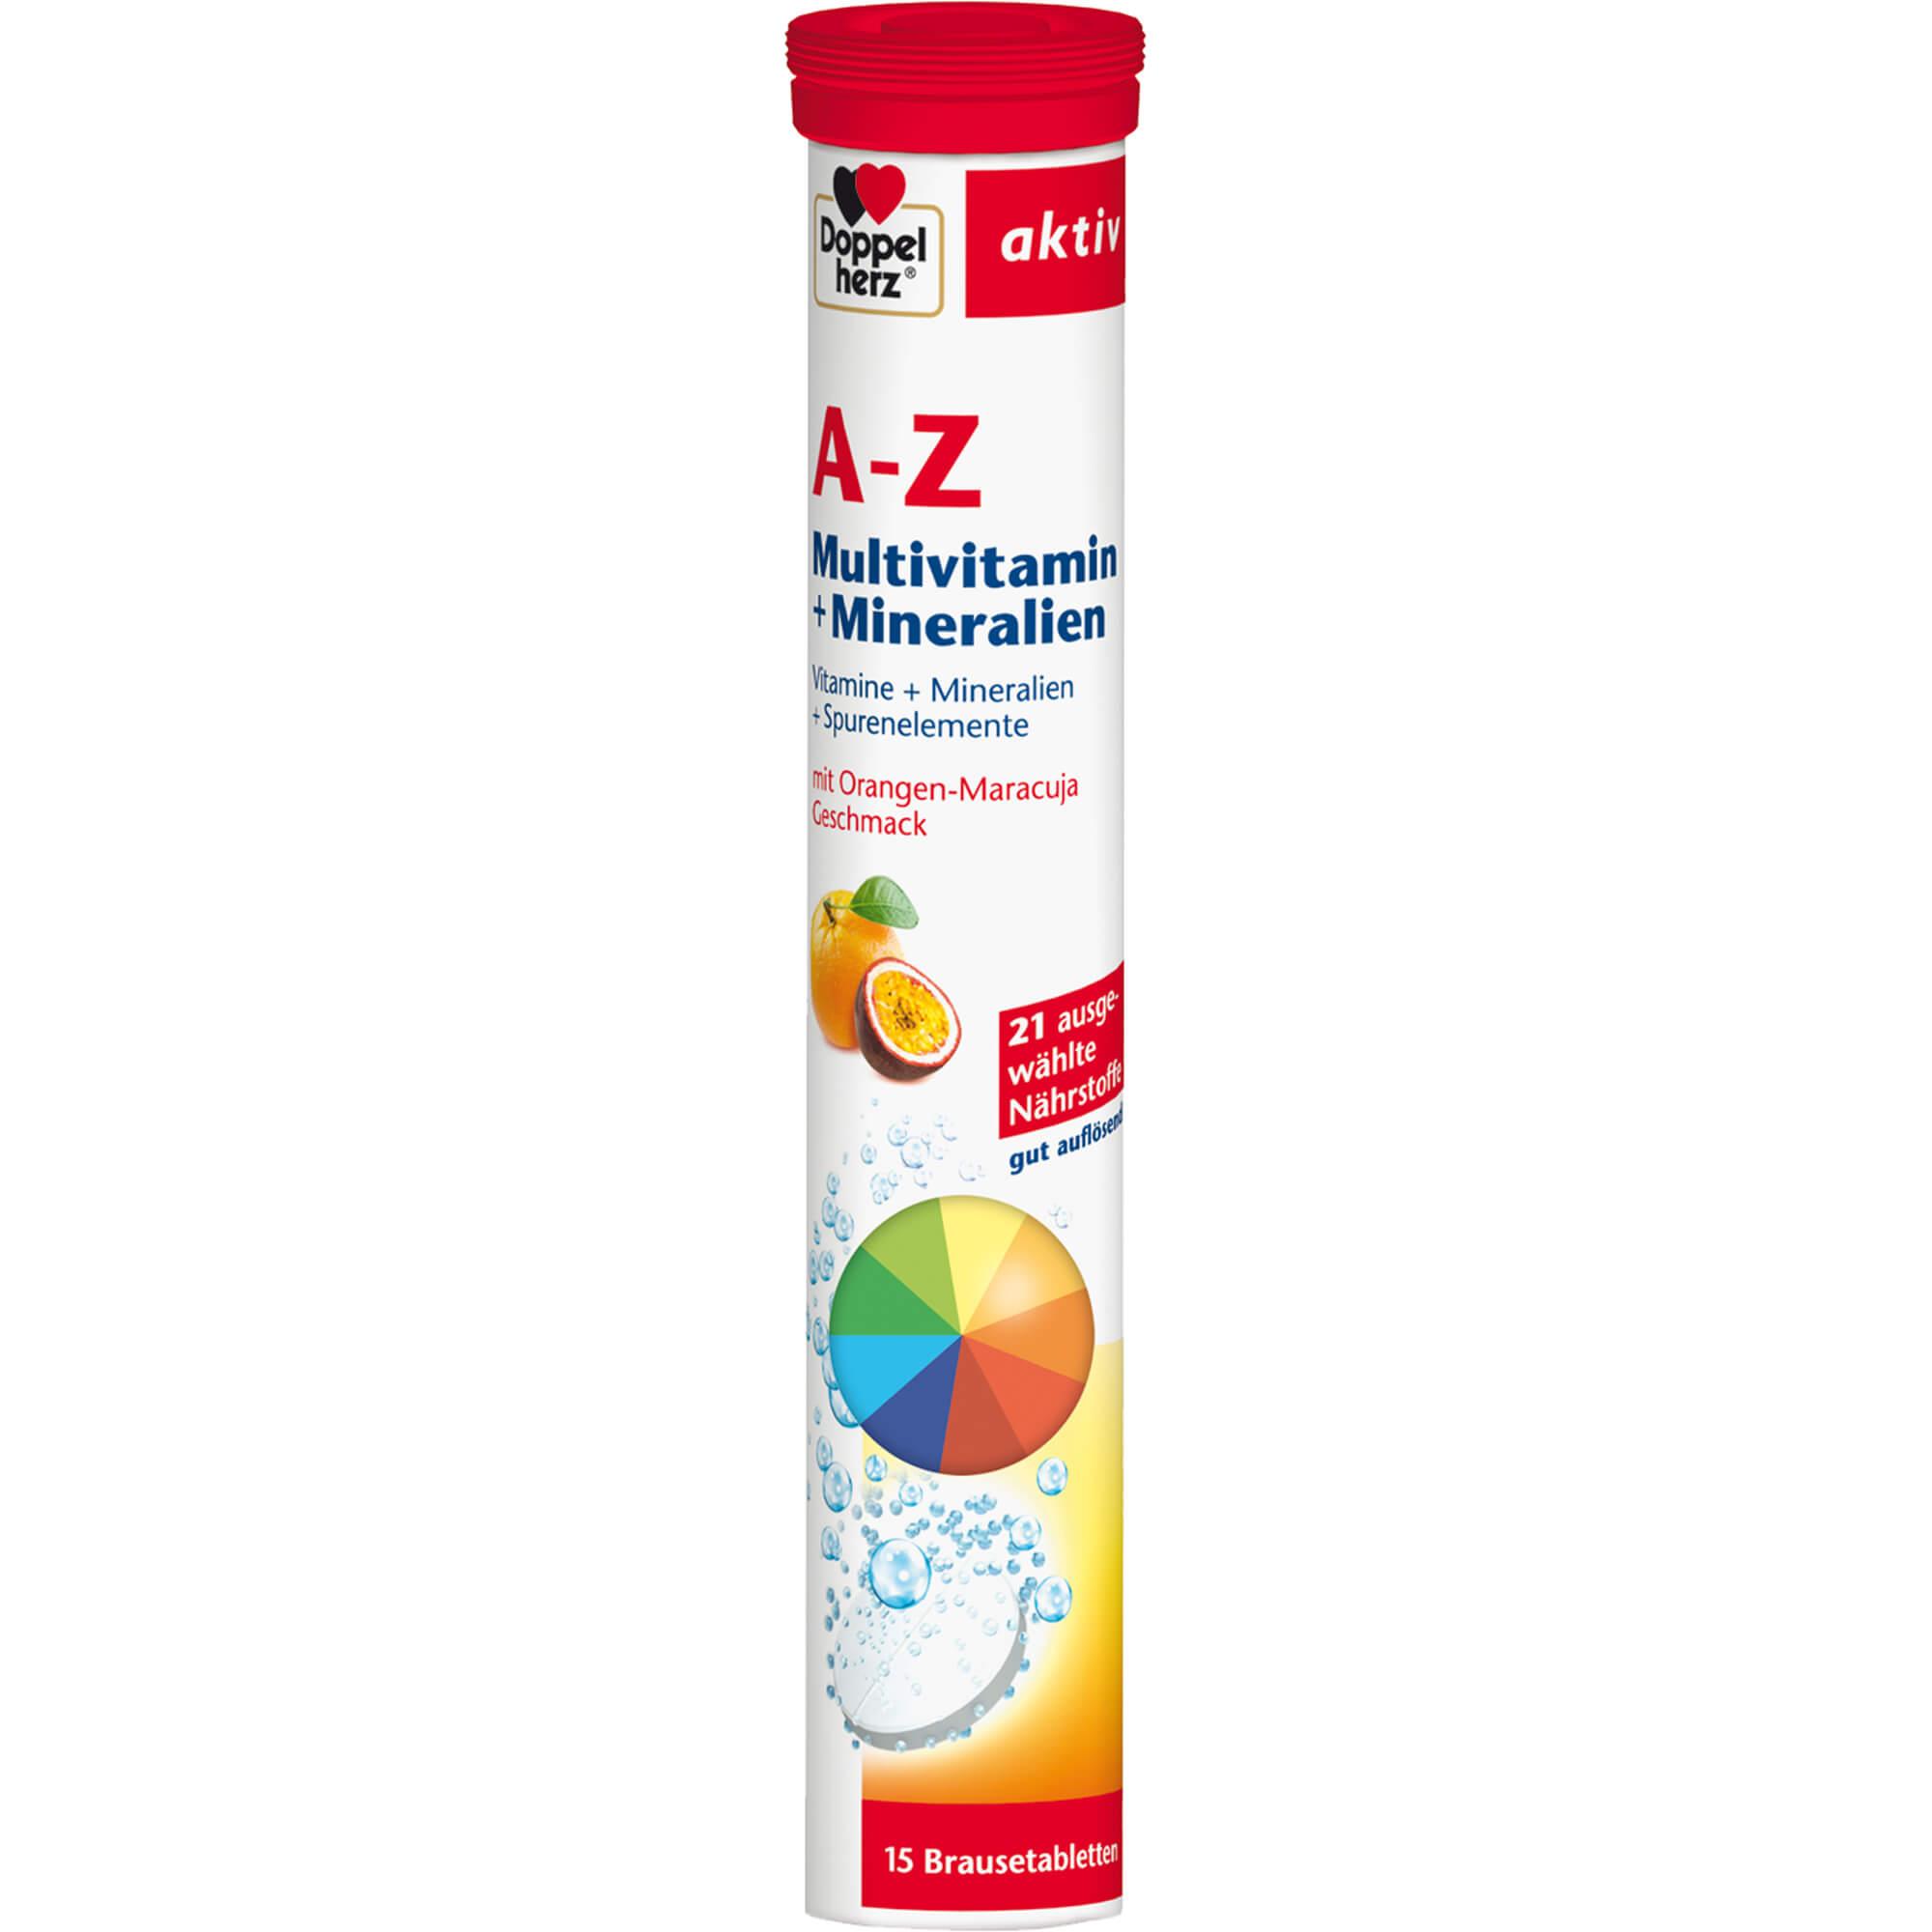 DOPPELHERZ A-Z Multivitamin+Mineralien Brausetabl.